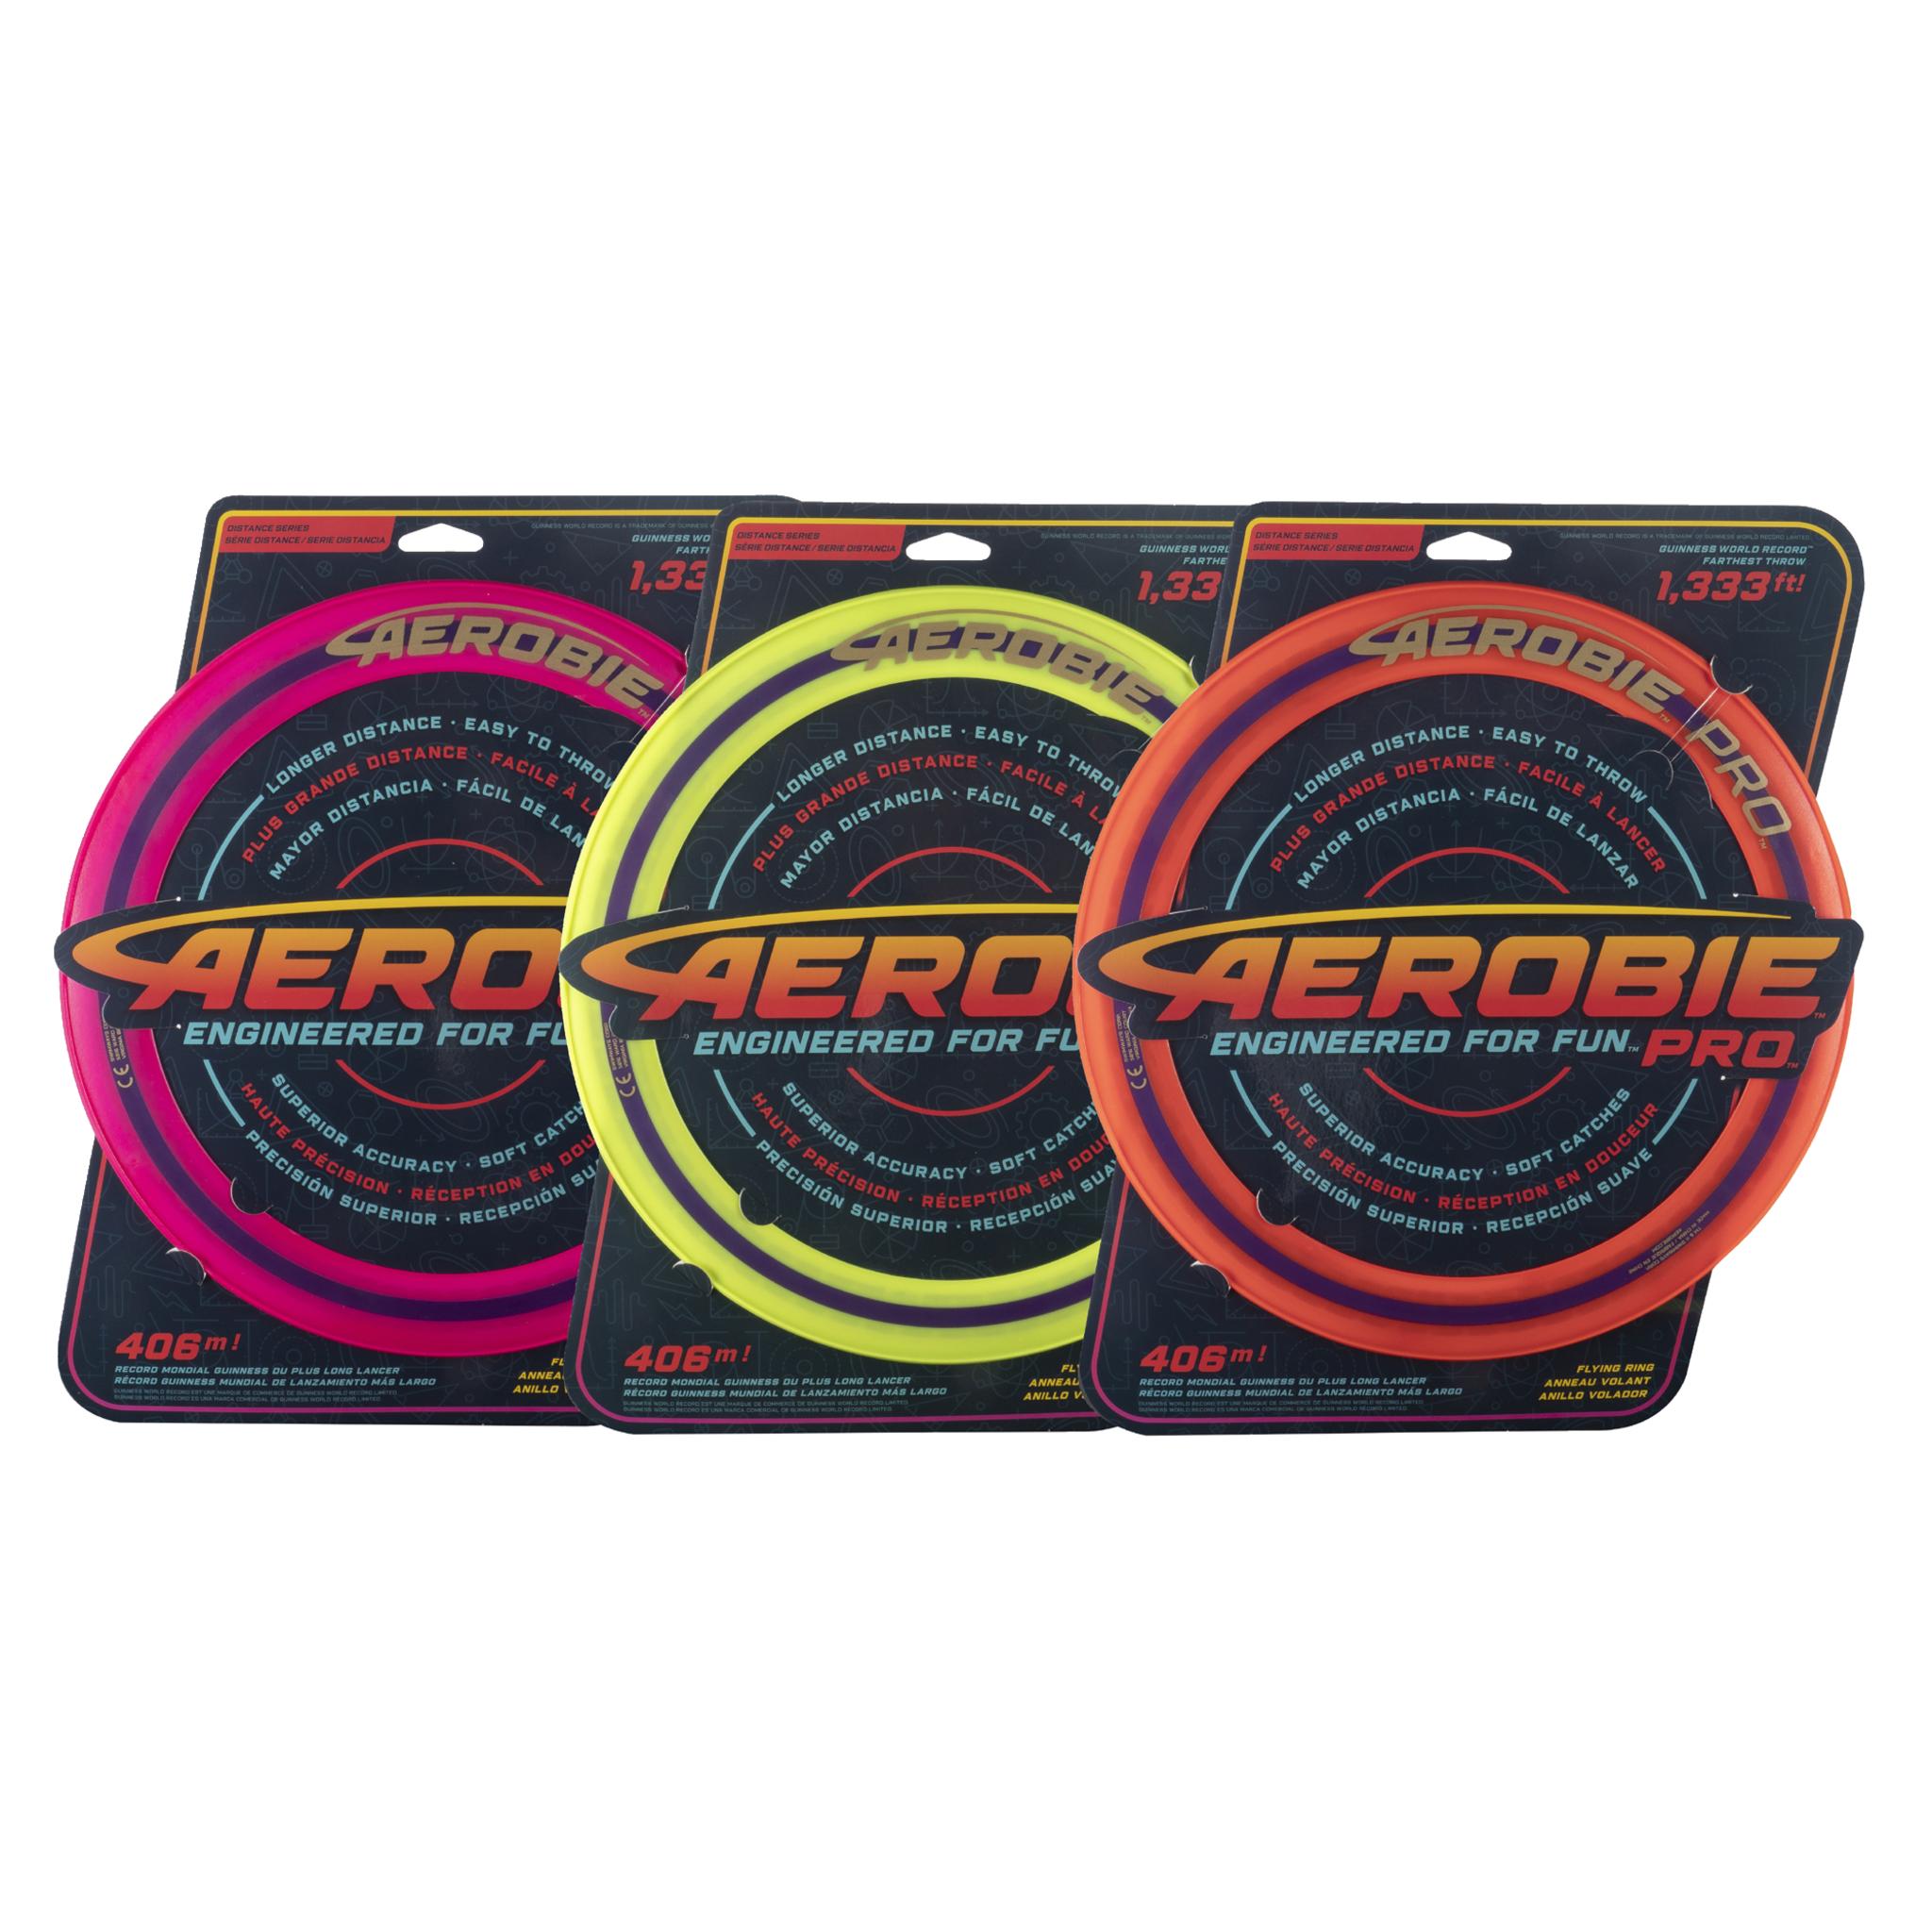 Aerobie Pro ring, frisbee